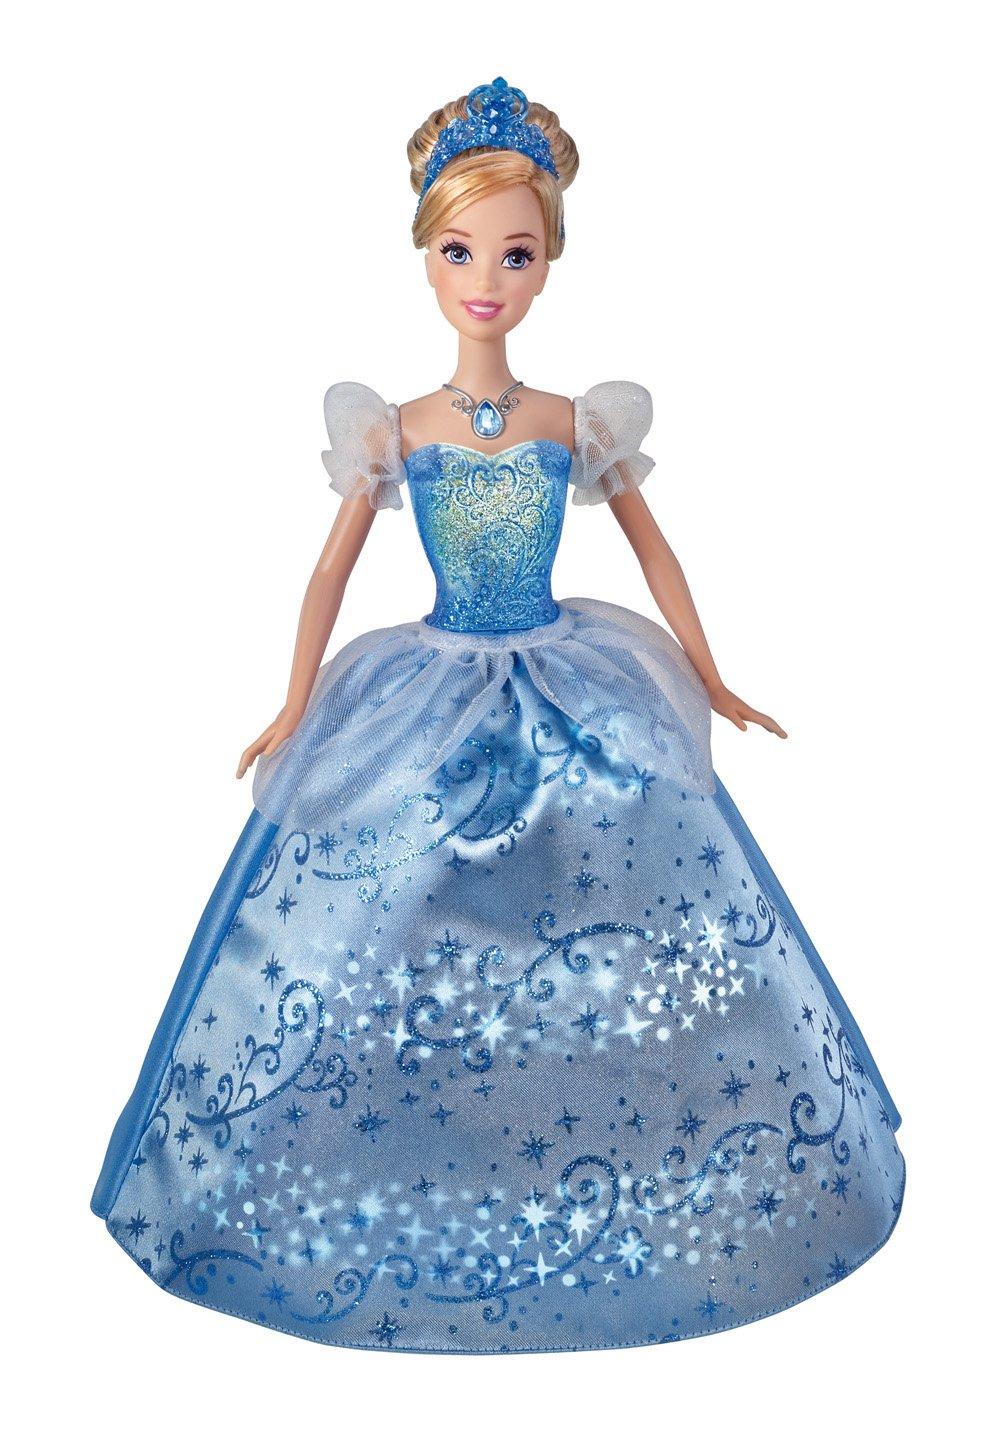 Amazon.com: Disney Princess Swirling Lights Cinderella Doll: Toys ...